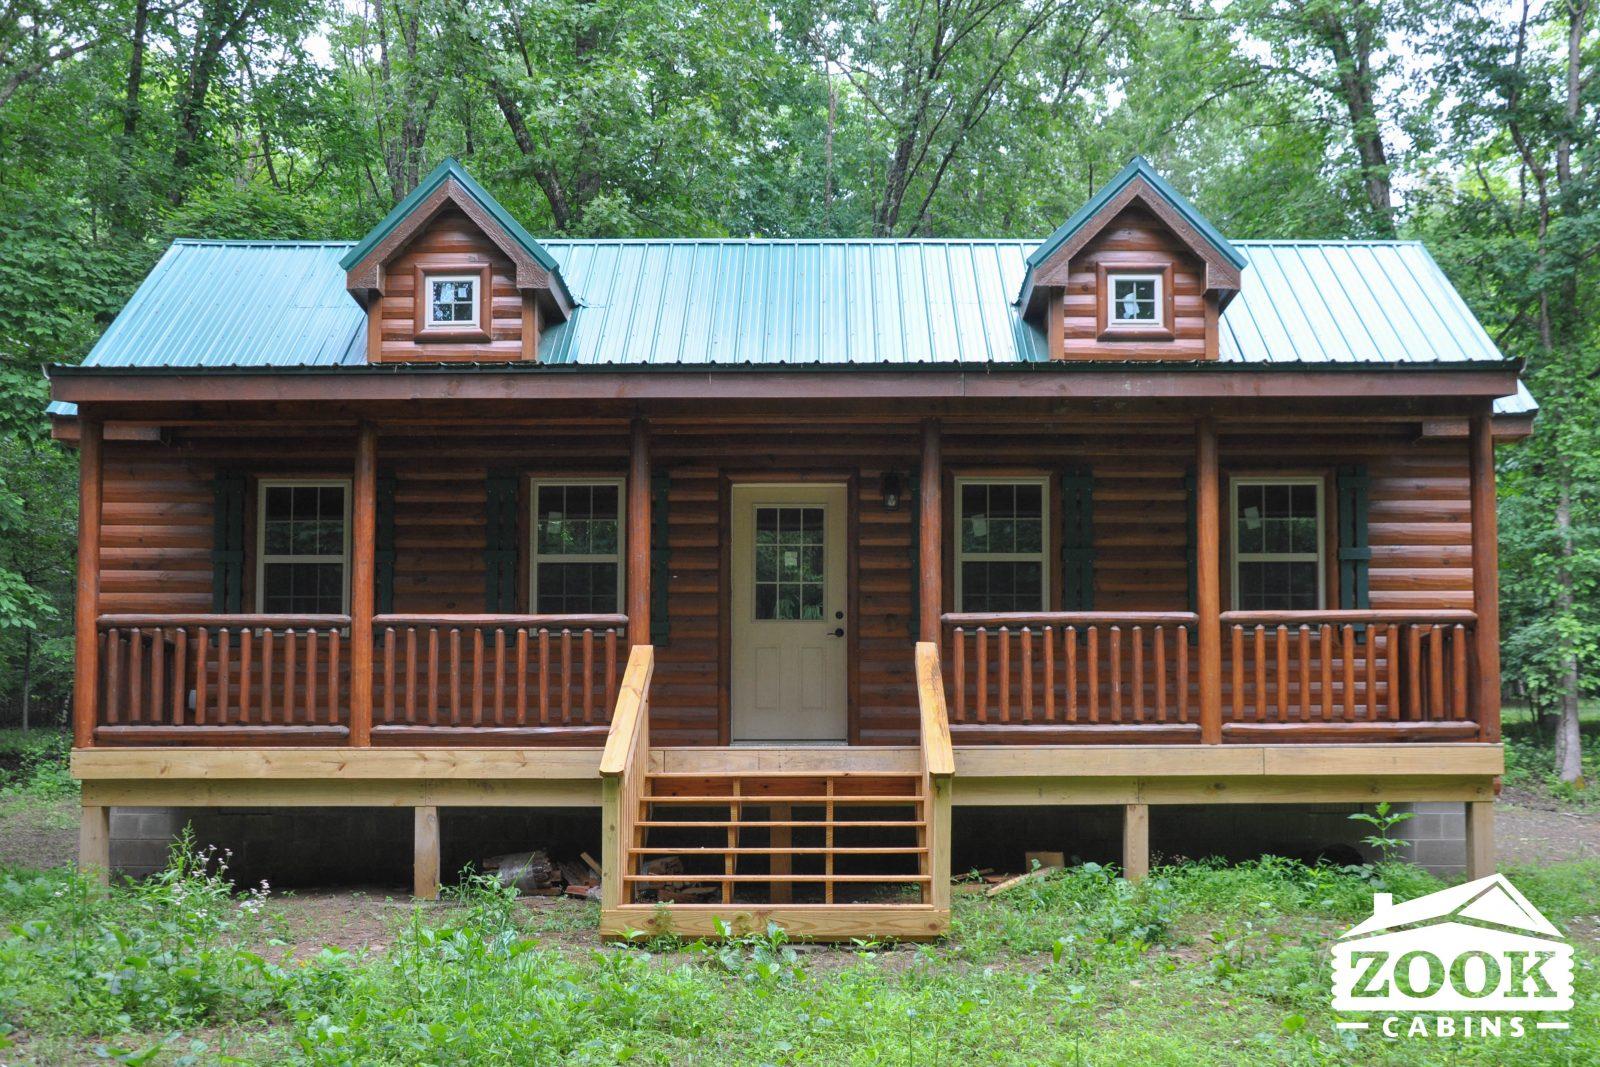 The Plymouth Modular Log Cabin in South Carolina